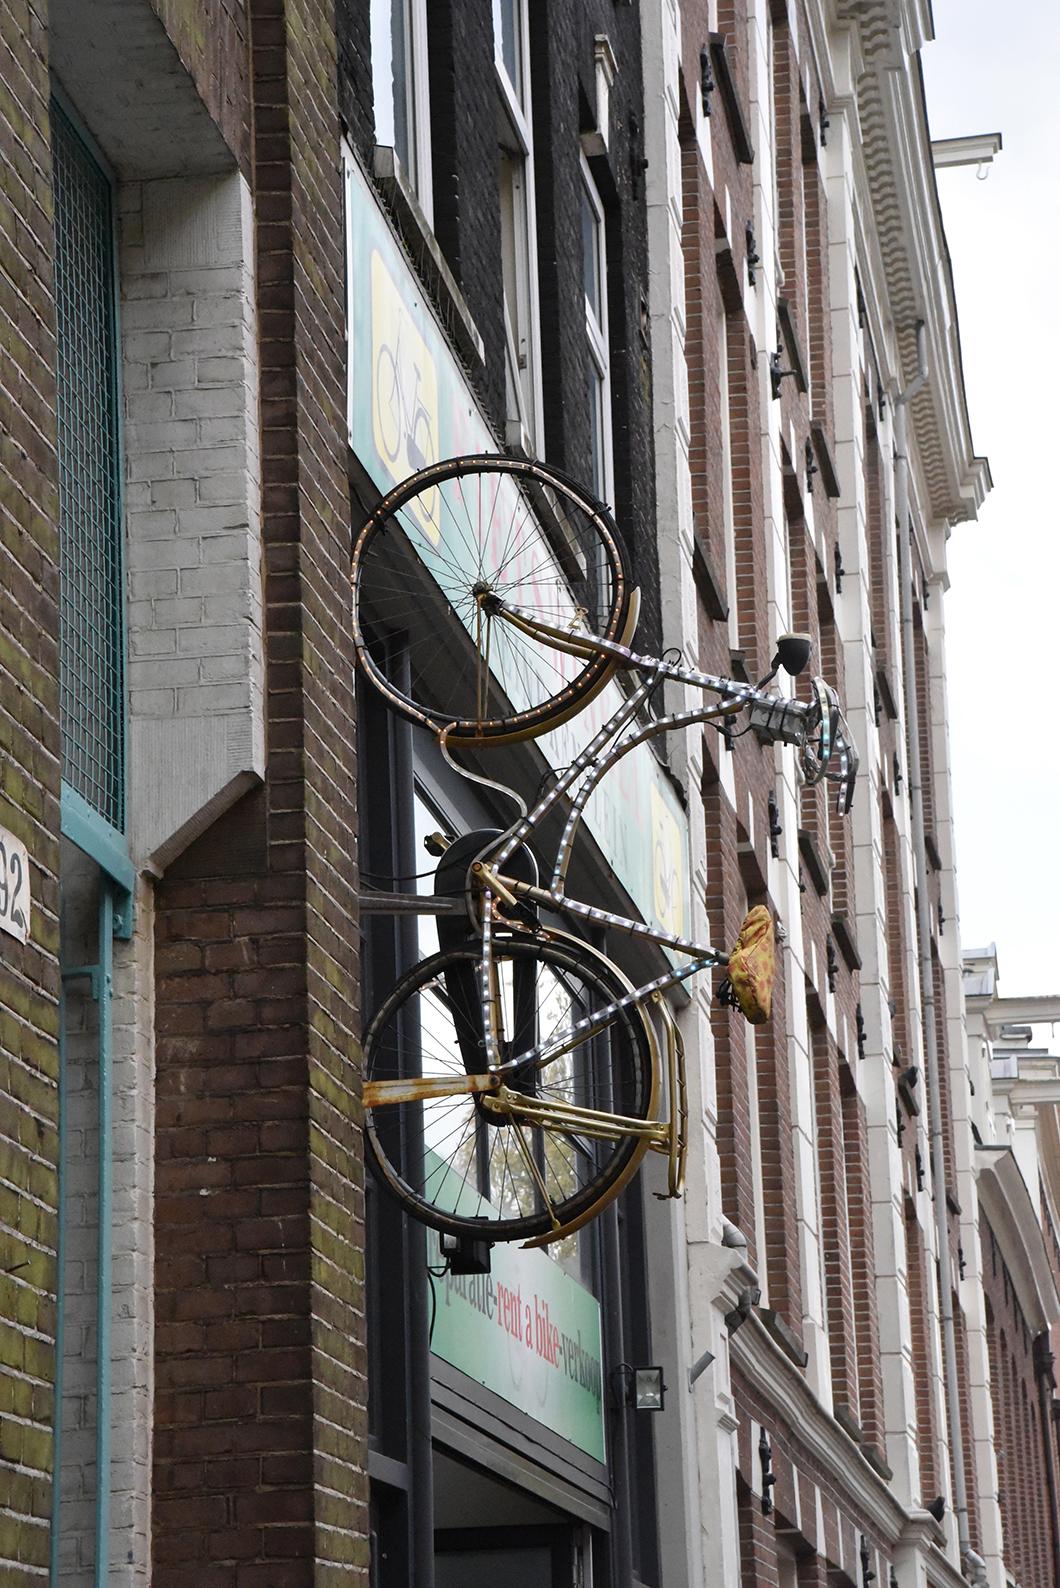 Albert Cuypmarkt - Food market Amsterdam